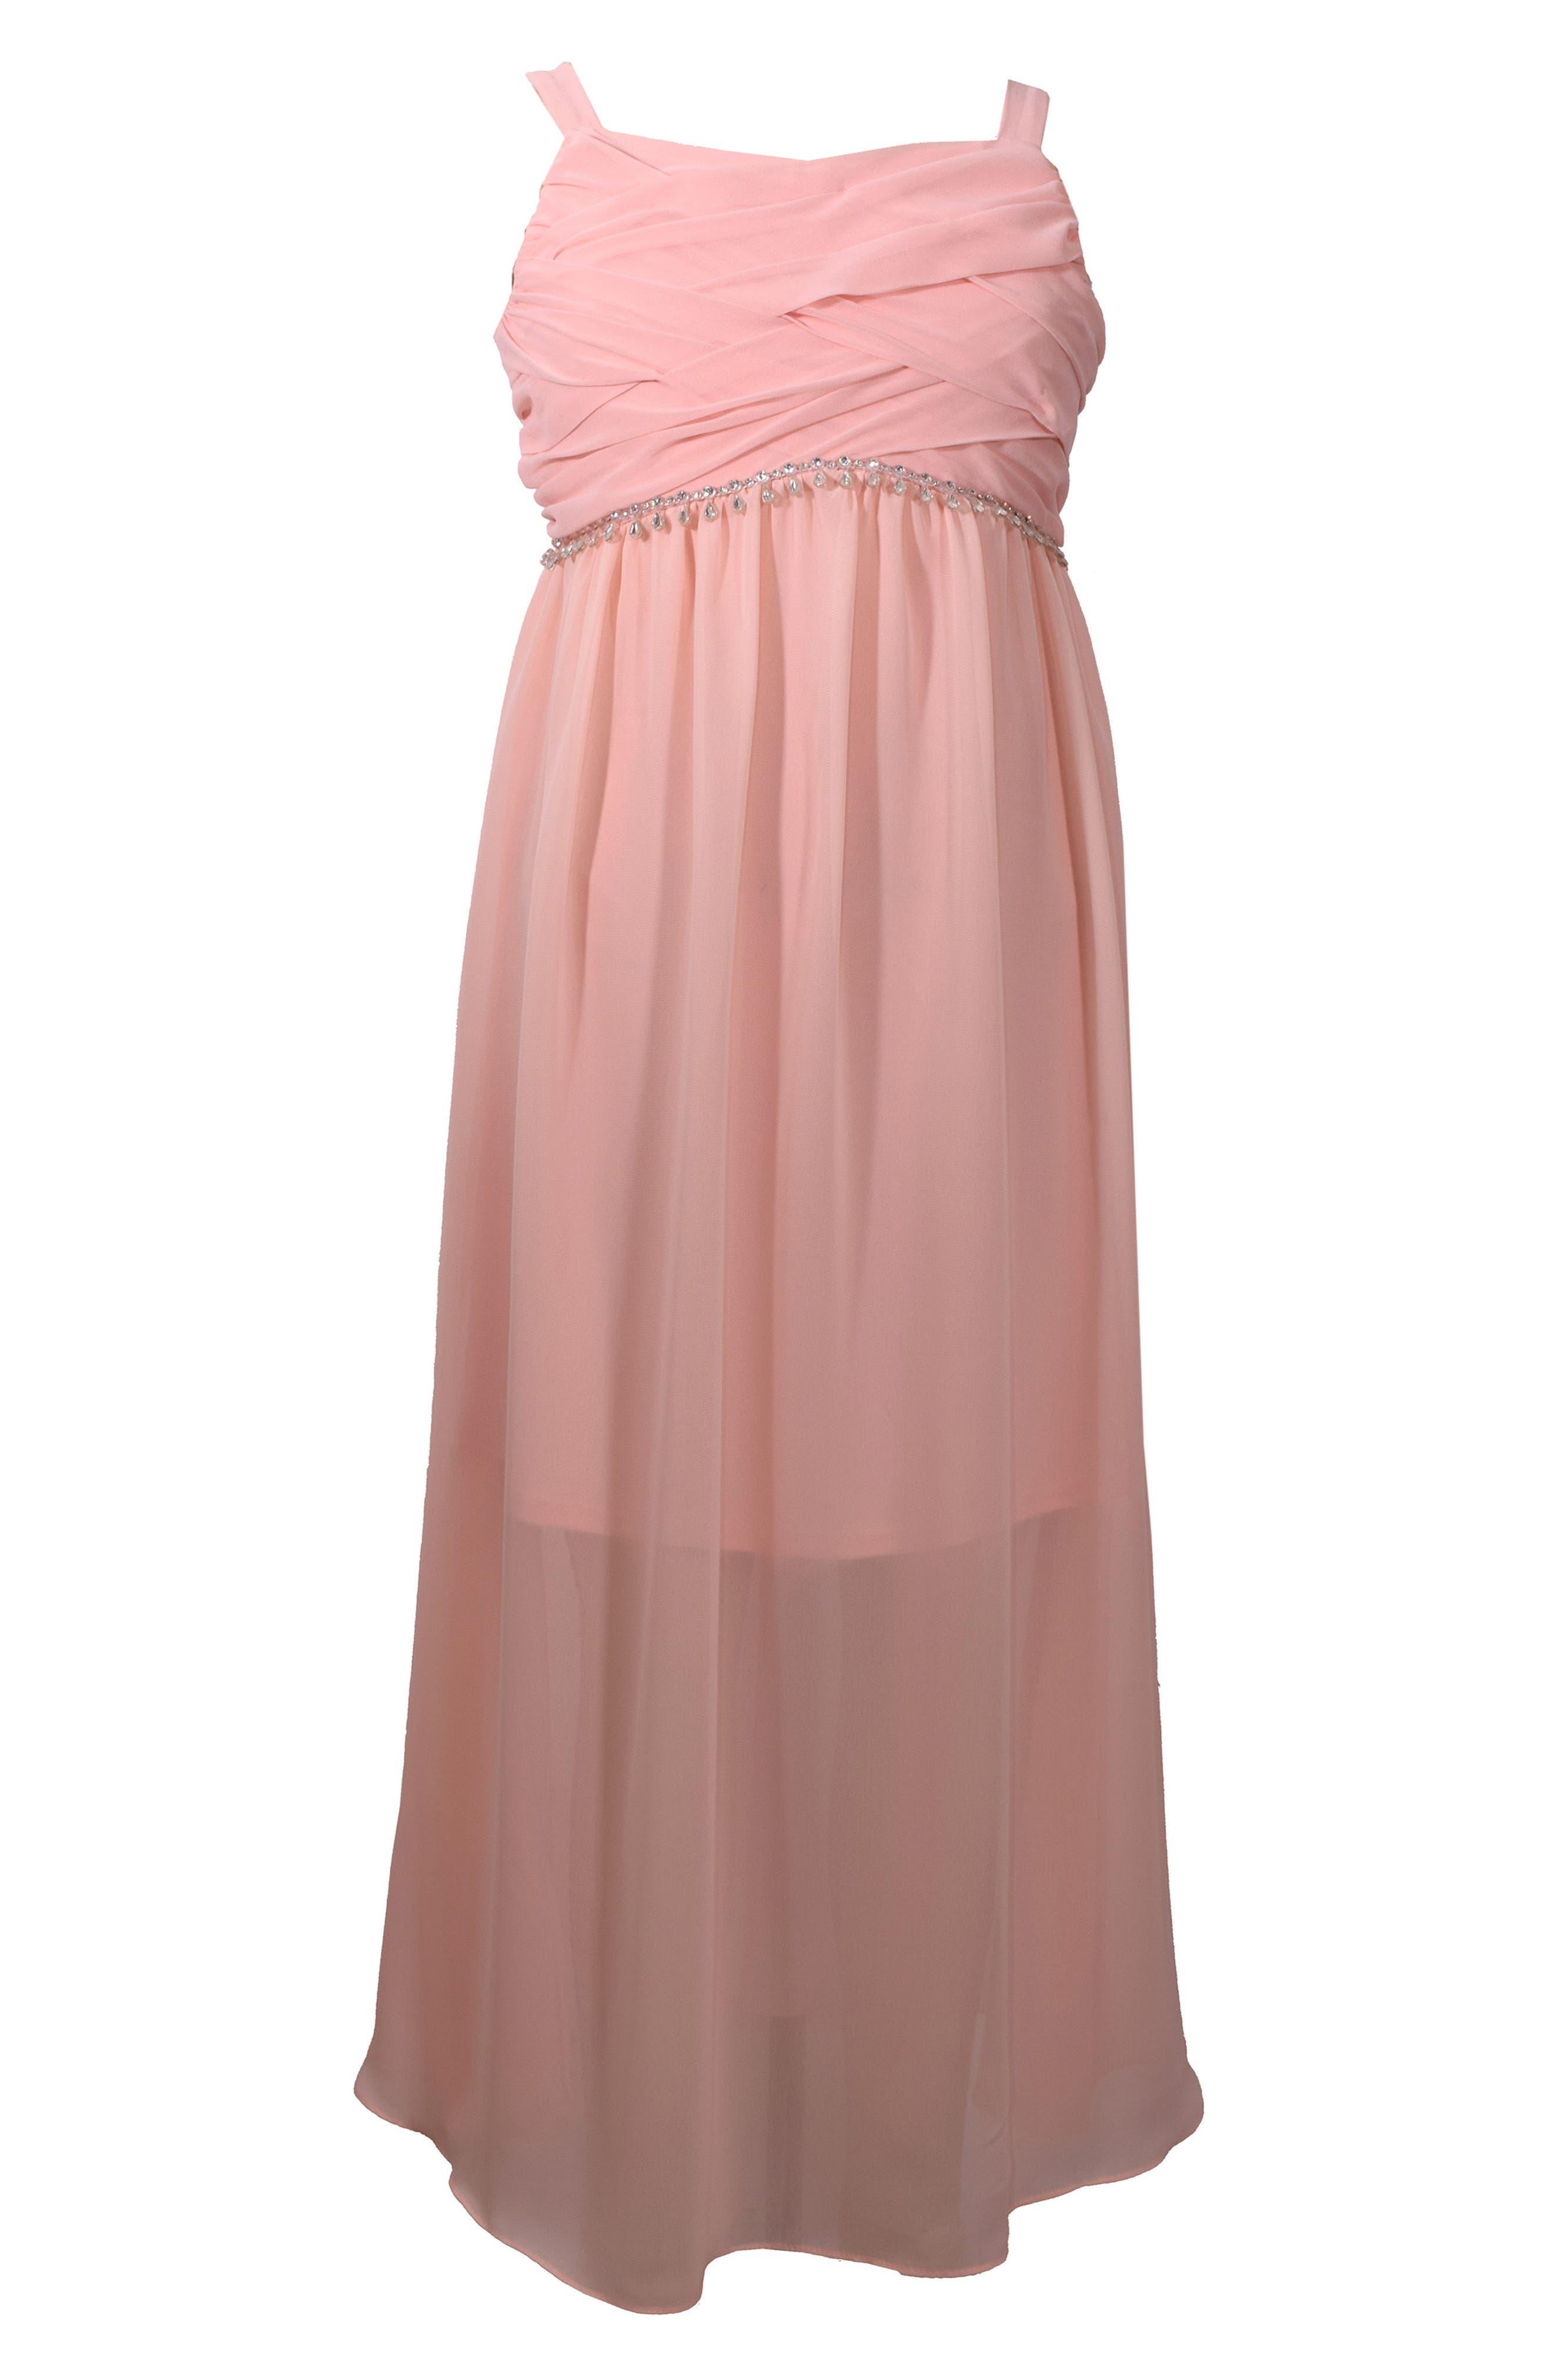 Sleeveless Chiffon Dress,                             Main thumbnail 1, color,                             Peach